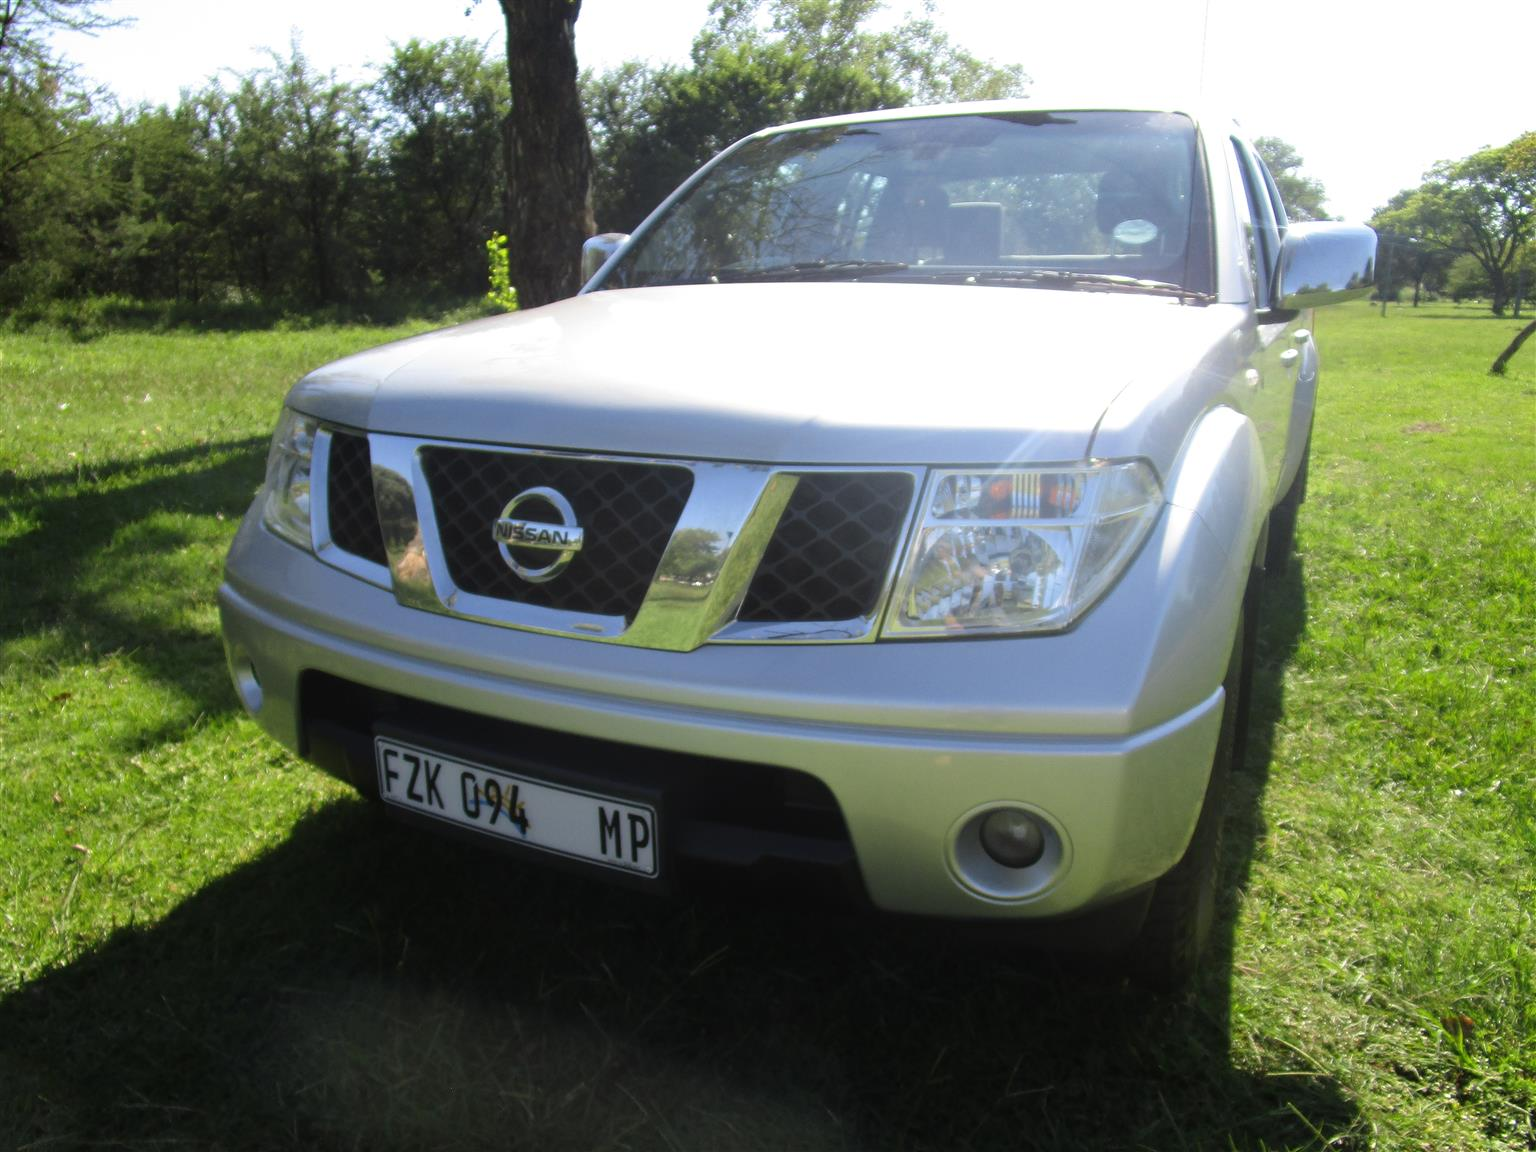 2013 Nissan Navara 2.5dCi double cab 4x4 LE